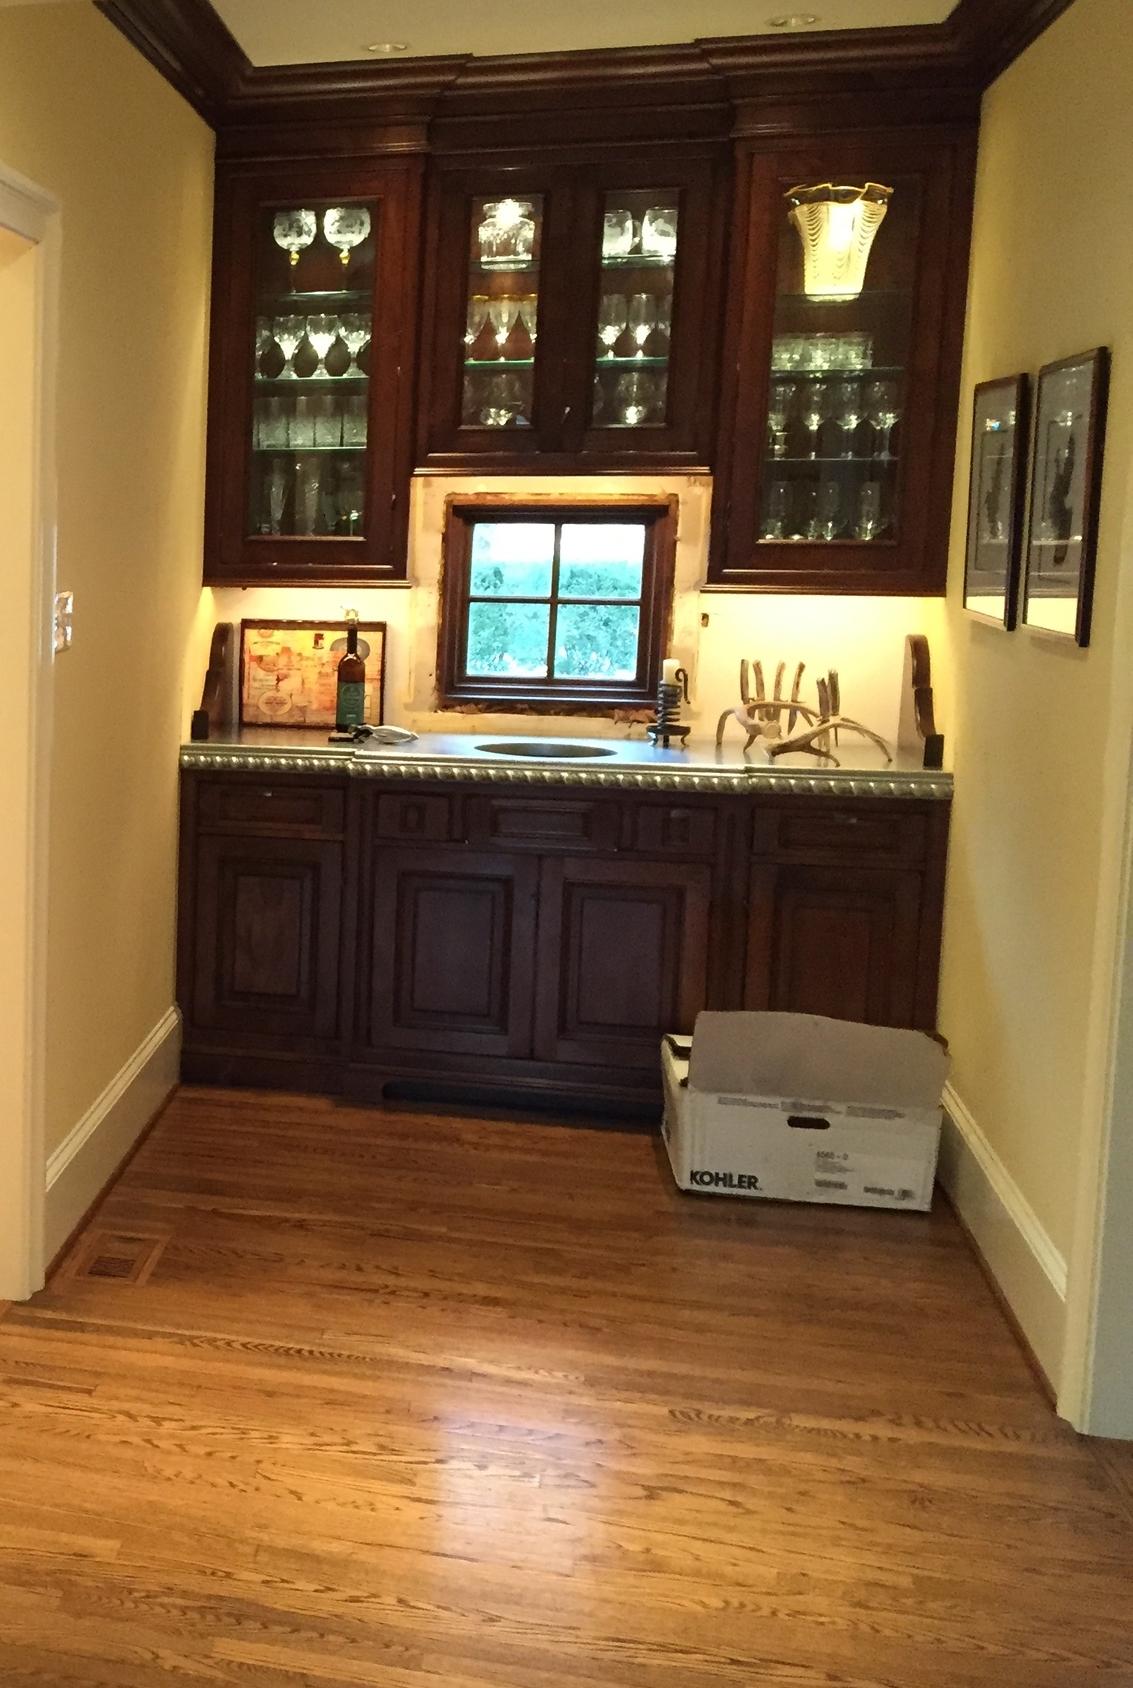 Under-cabinet & interior cabinet lighting.